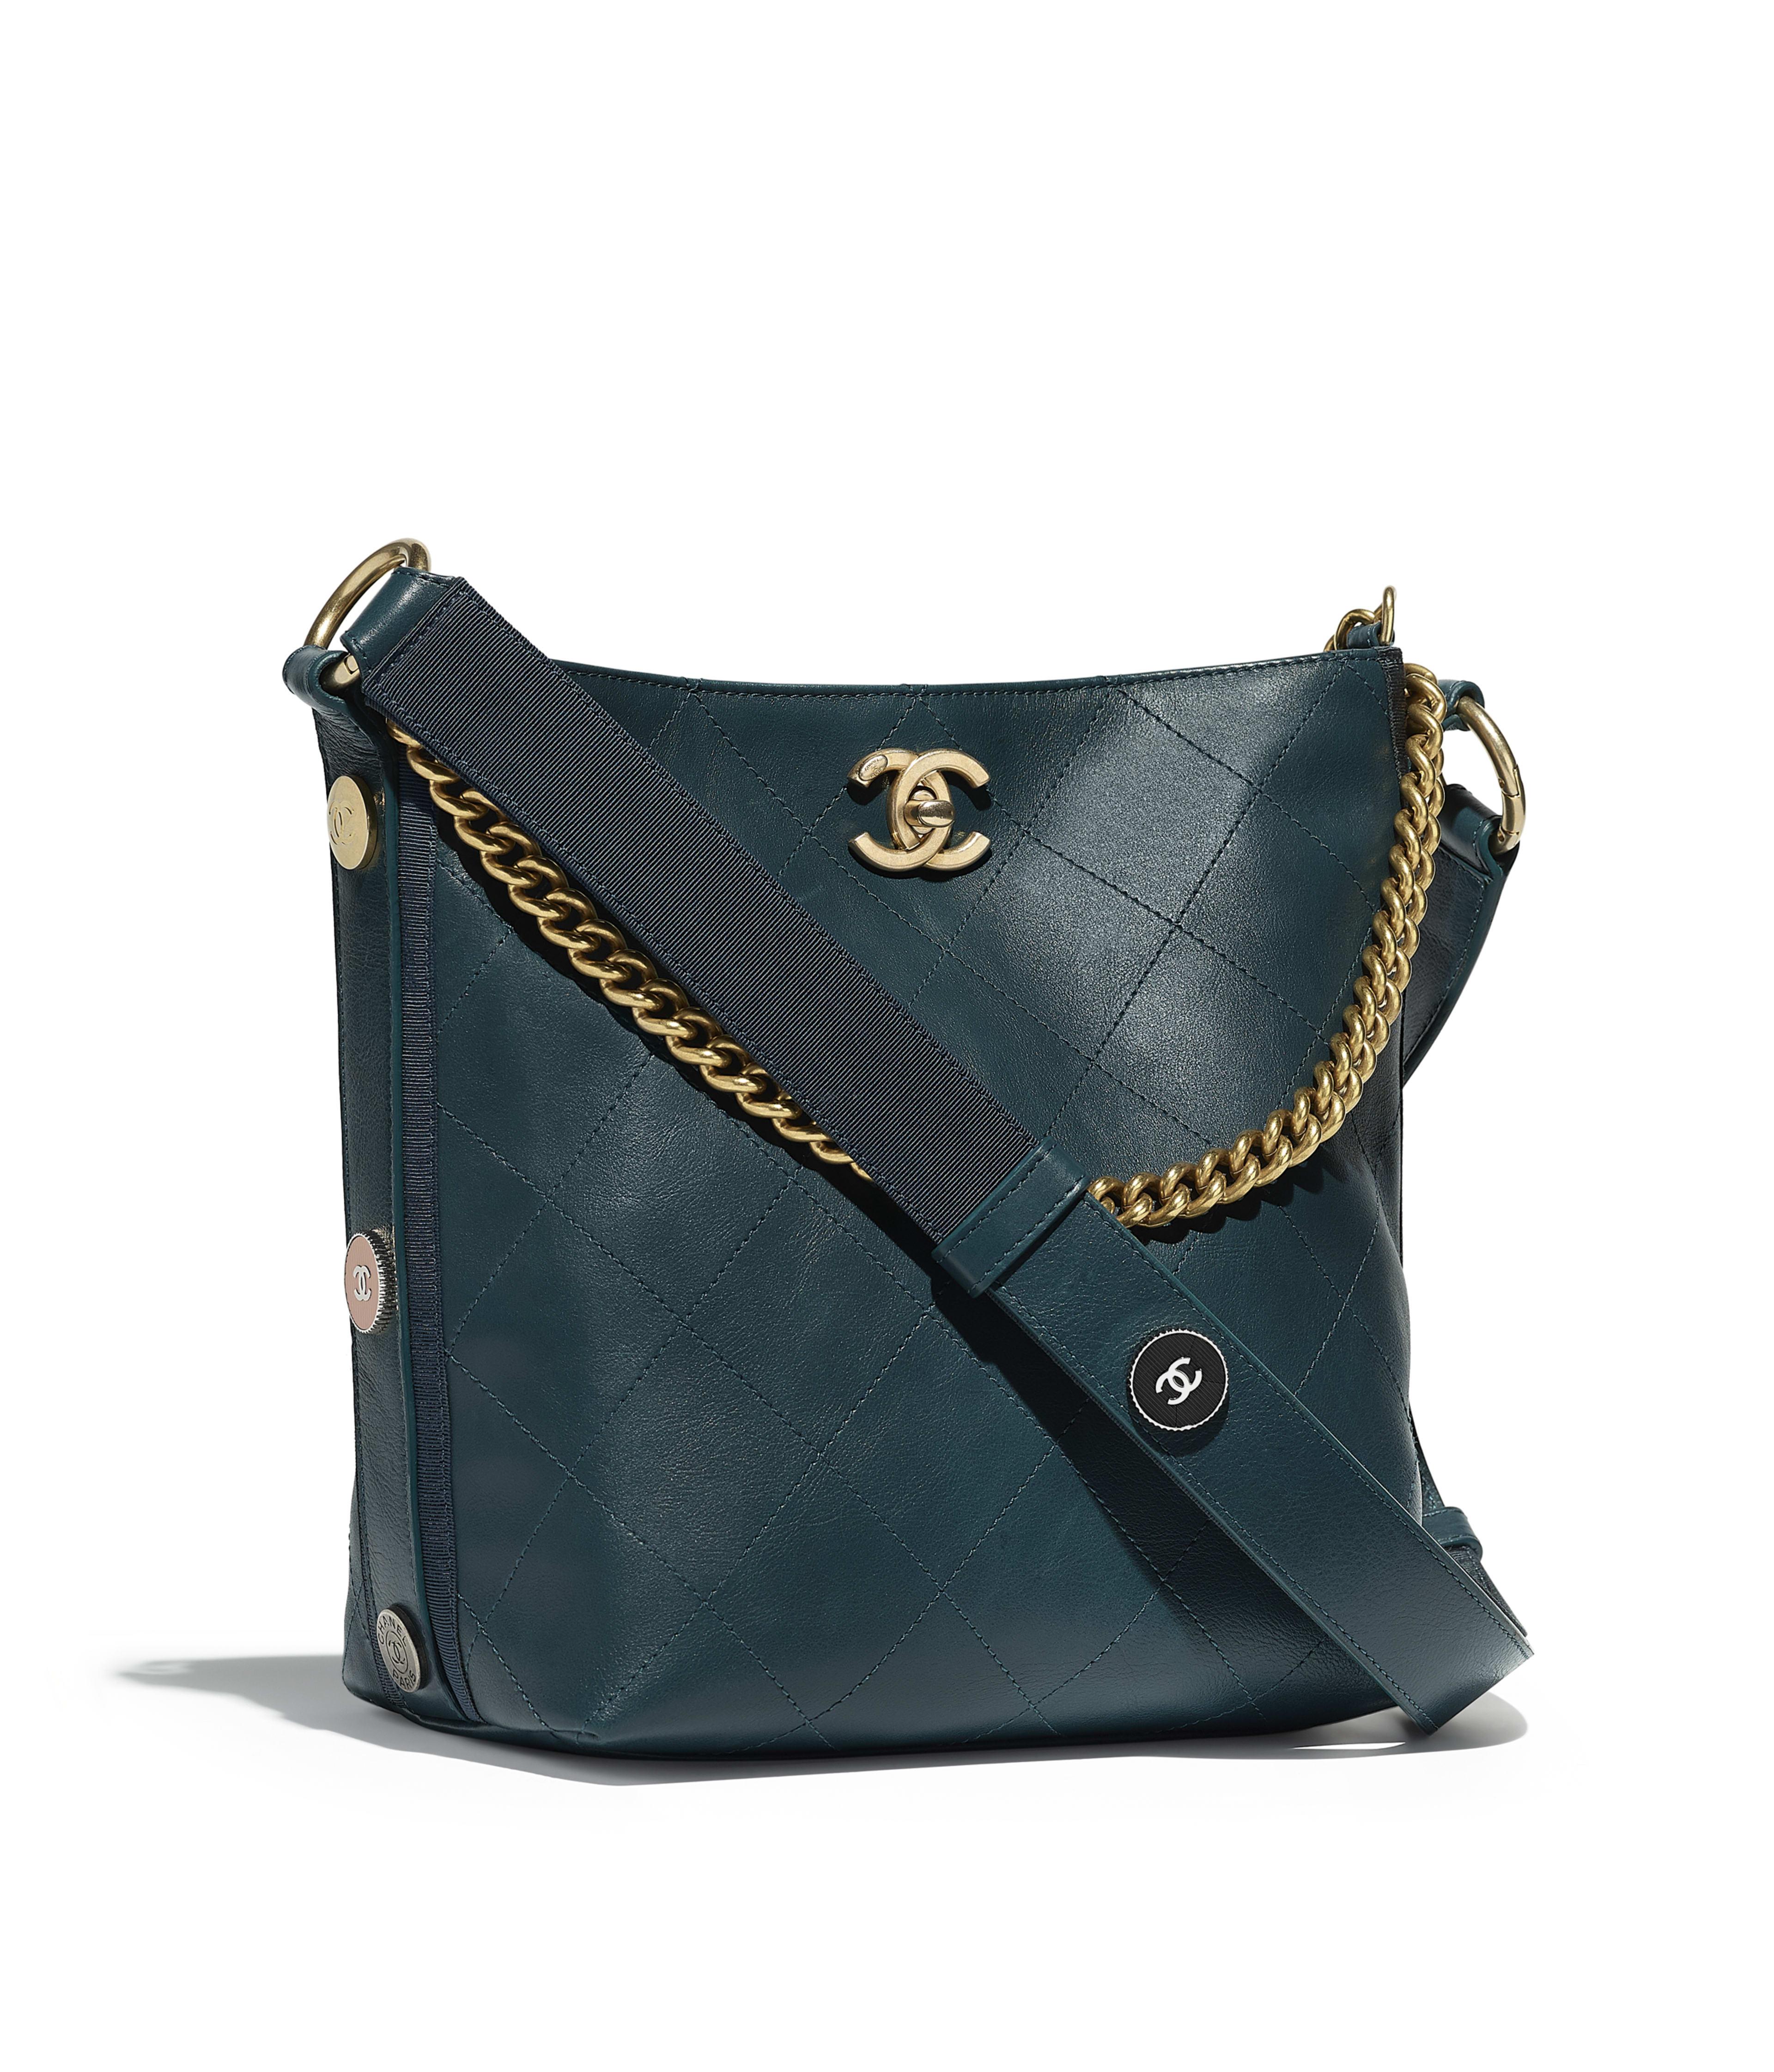 Hobo Handbag Calfskin Grosgrain Gold Tone Metal Blue Ref A57573y838285b403